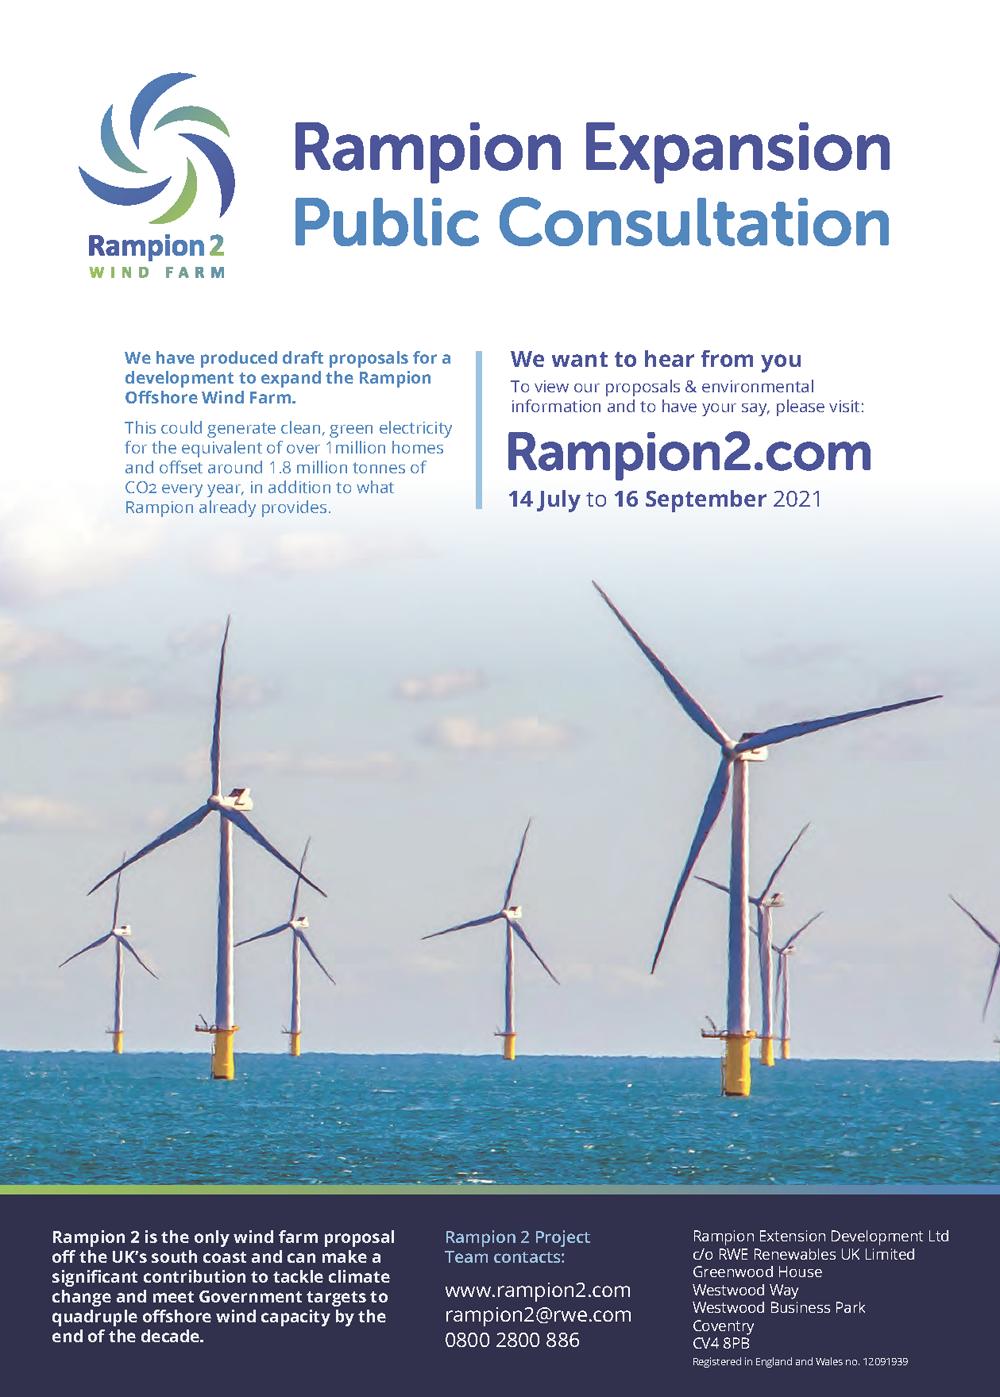 Rampion 2 Public Consultation Press Release